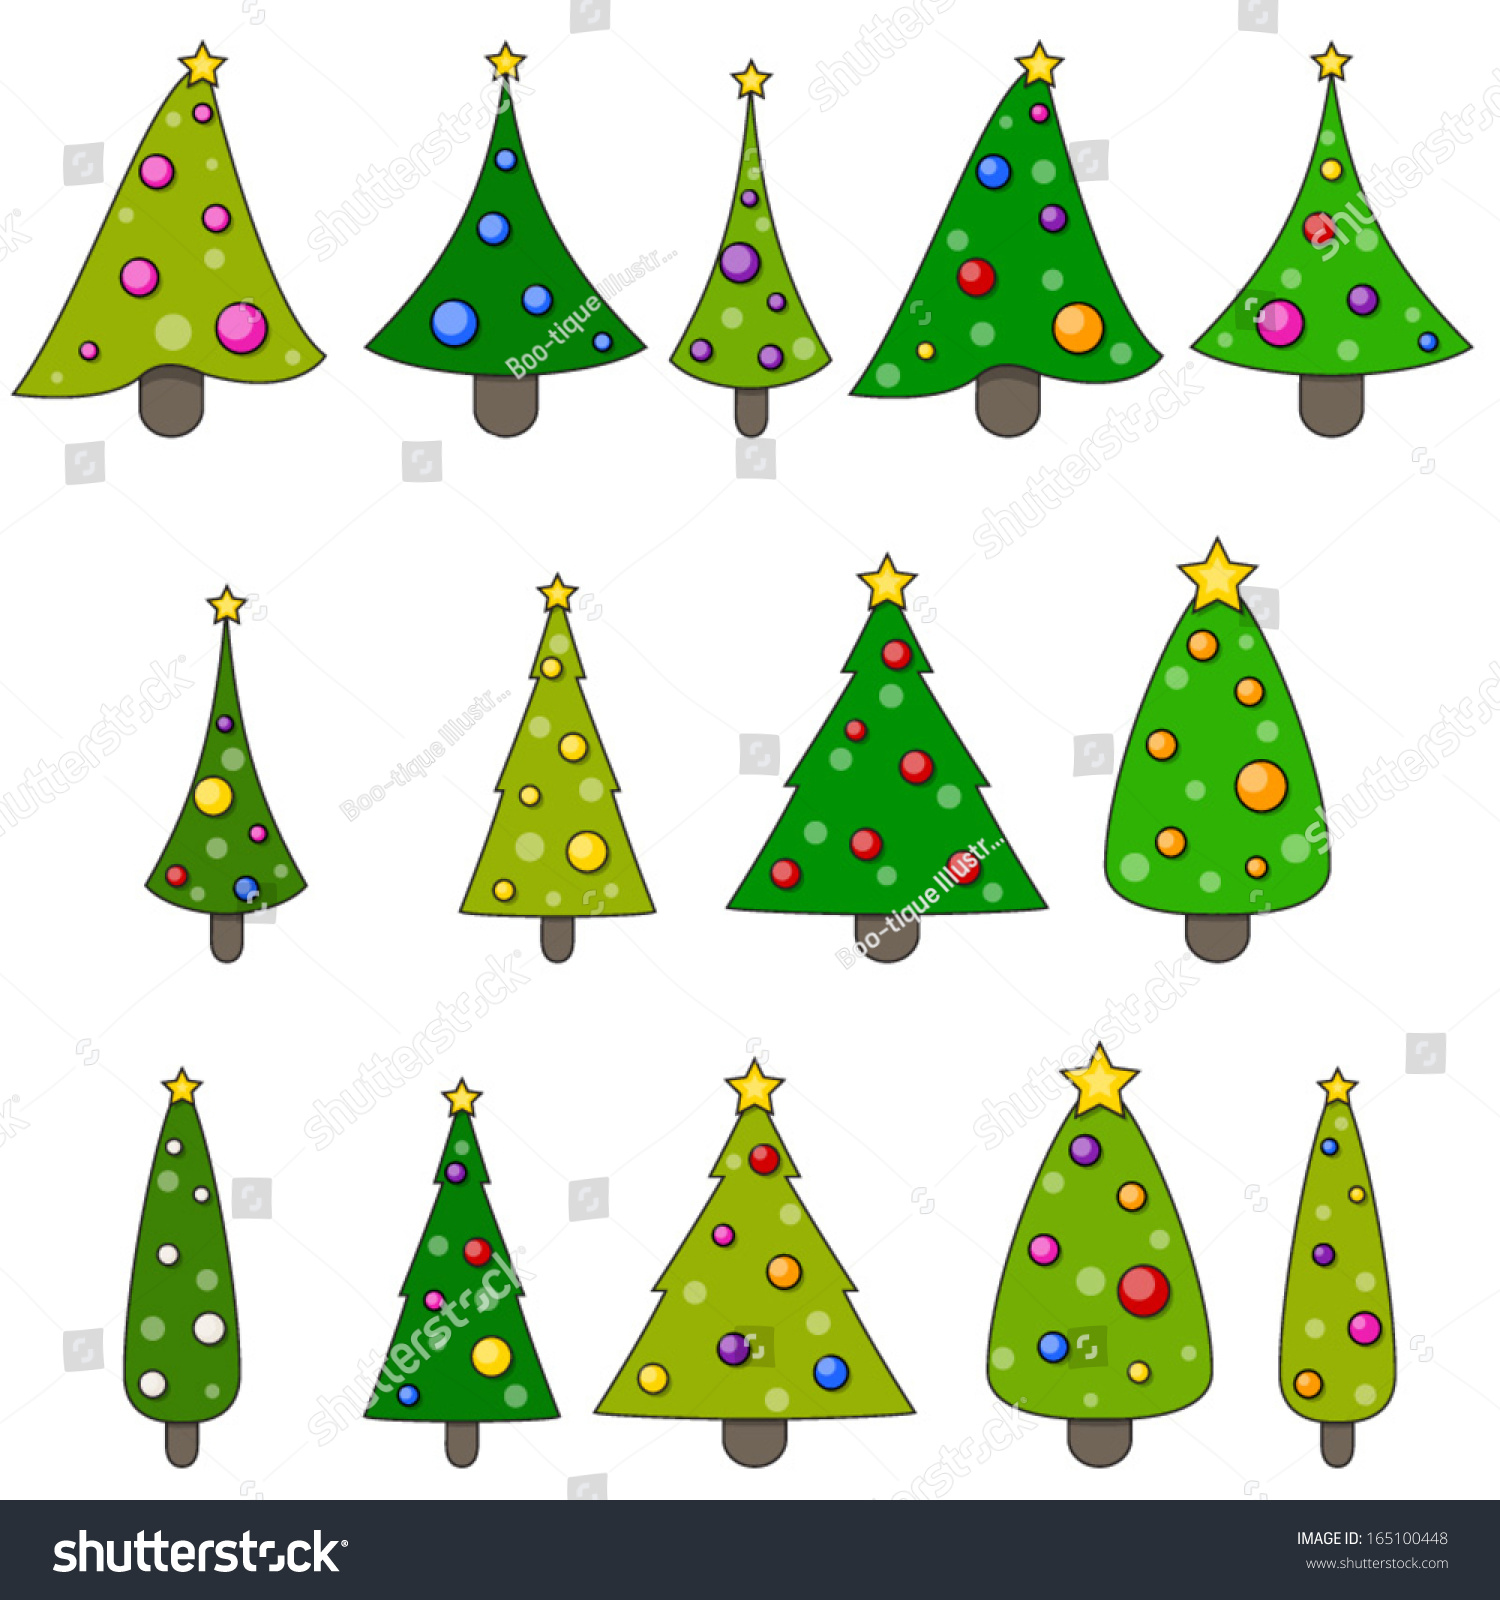 christmas tree clip art set xmas trees clip art - Christmas Tree Clip